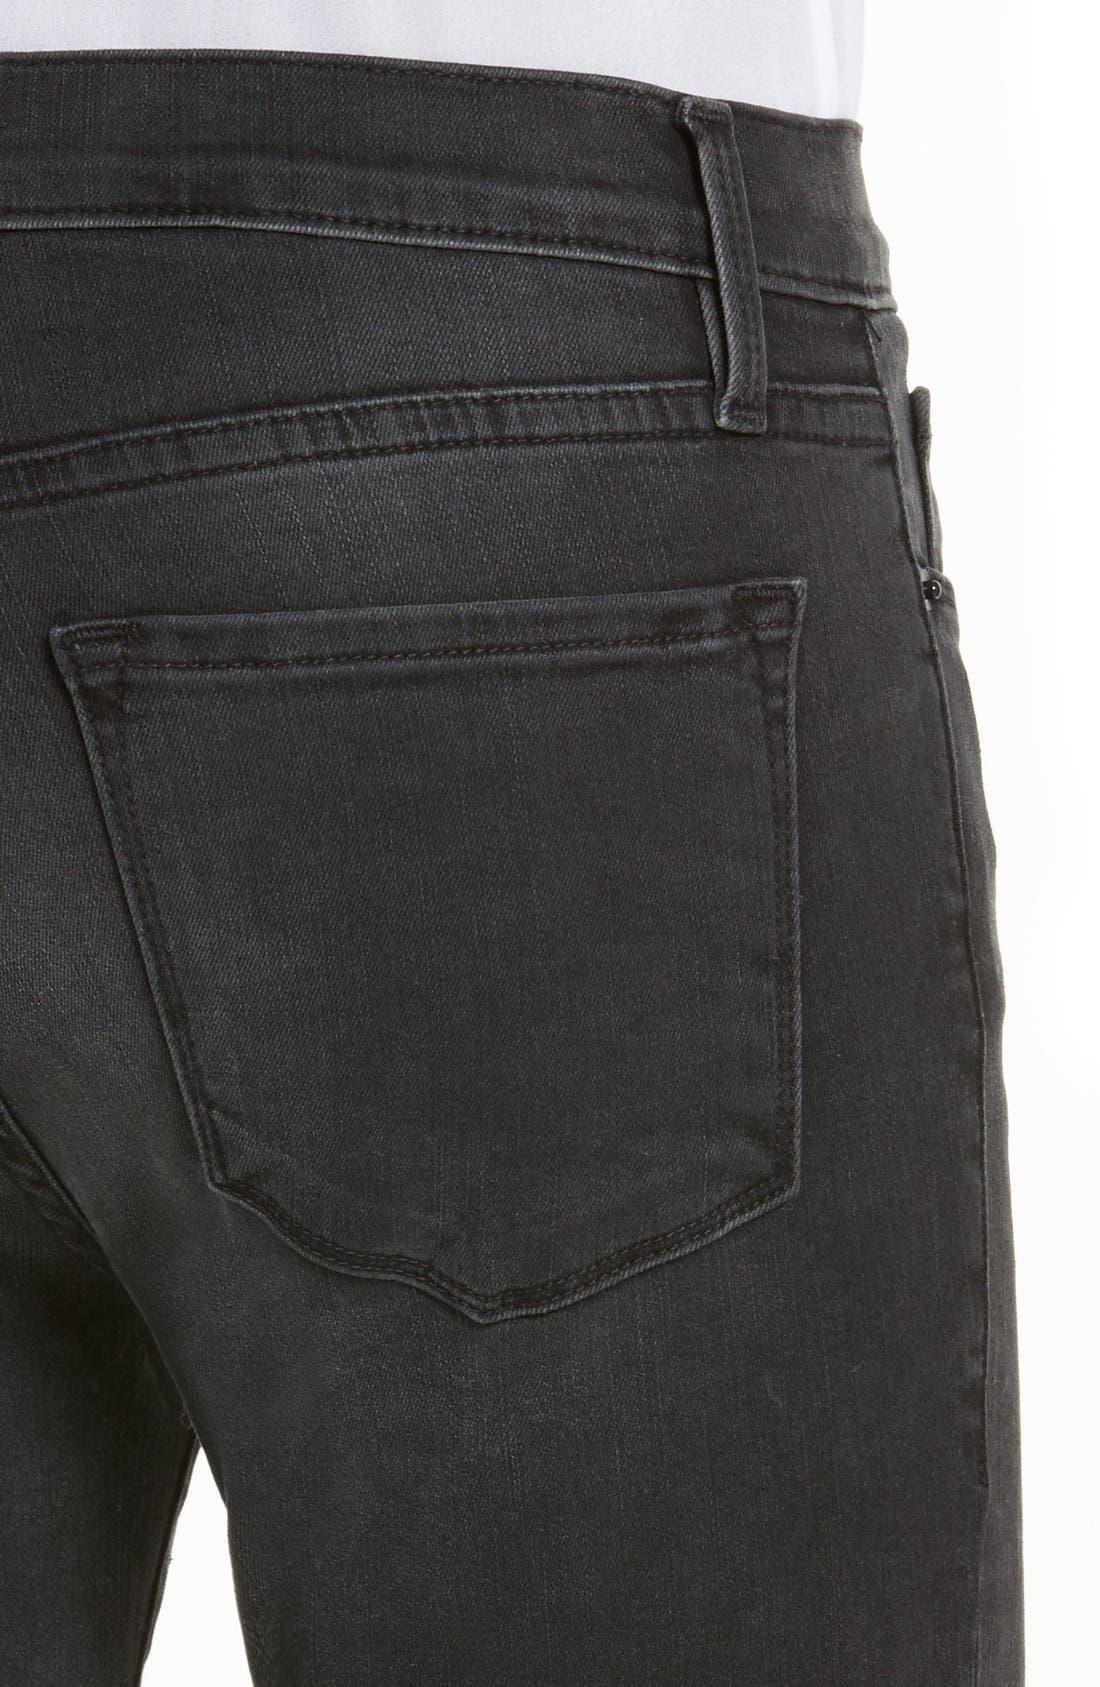 Alternate Image 4  - FRAME Le Crop Bell High Waist Crop Jeans (Whittier)